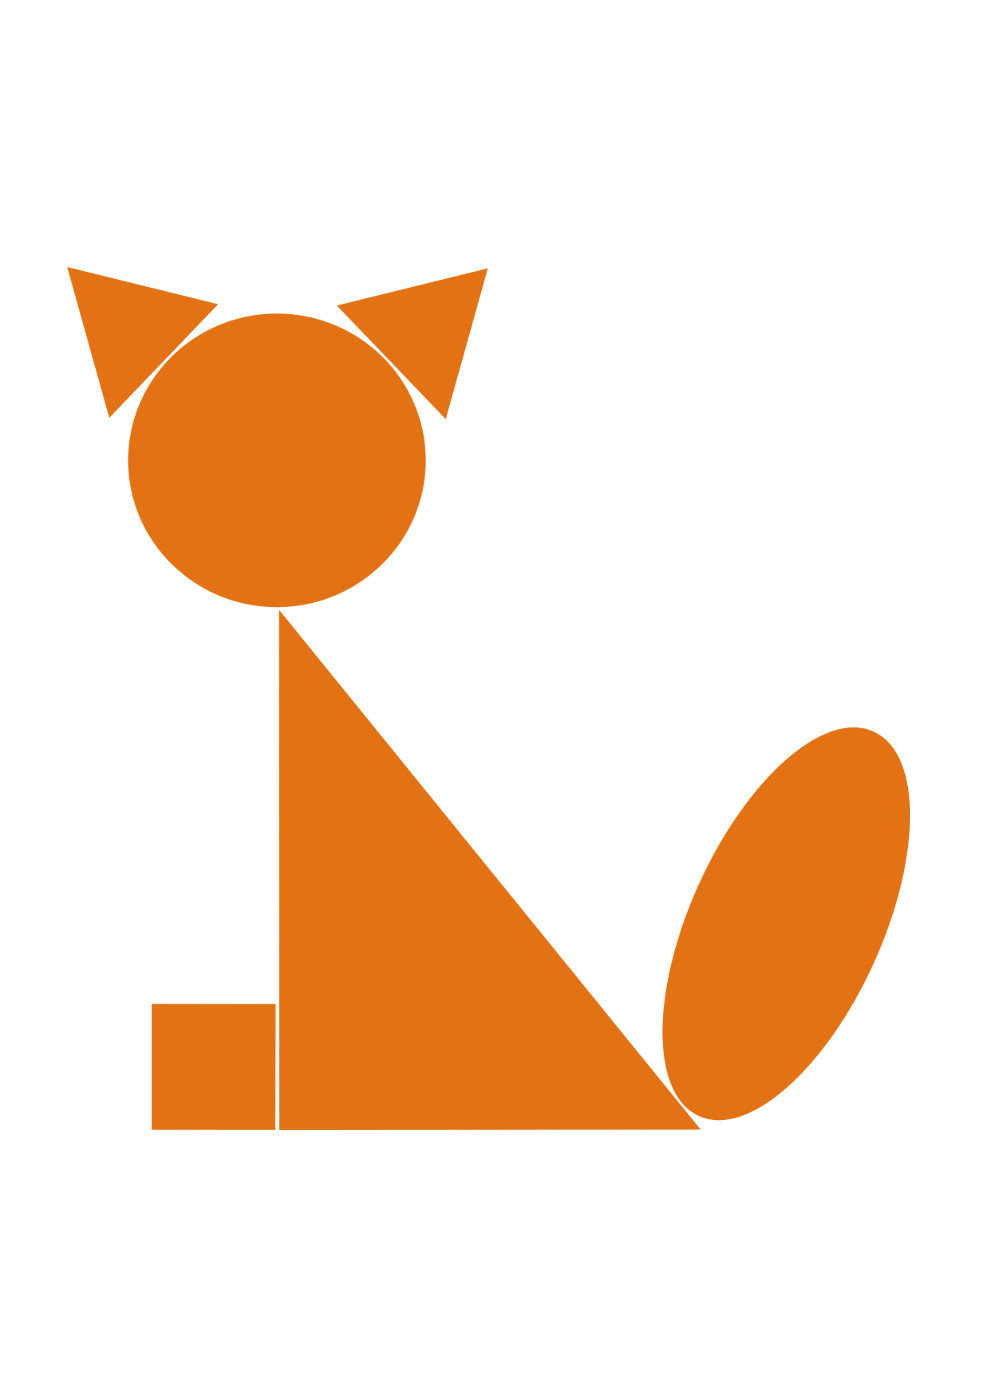 Картинки лиса из геометрических фигур